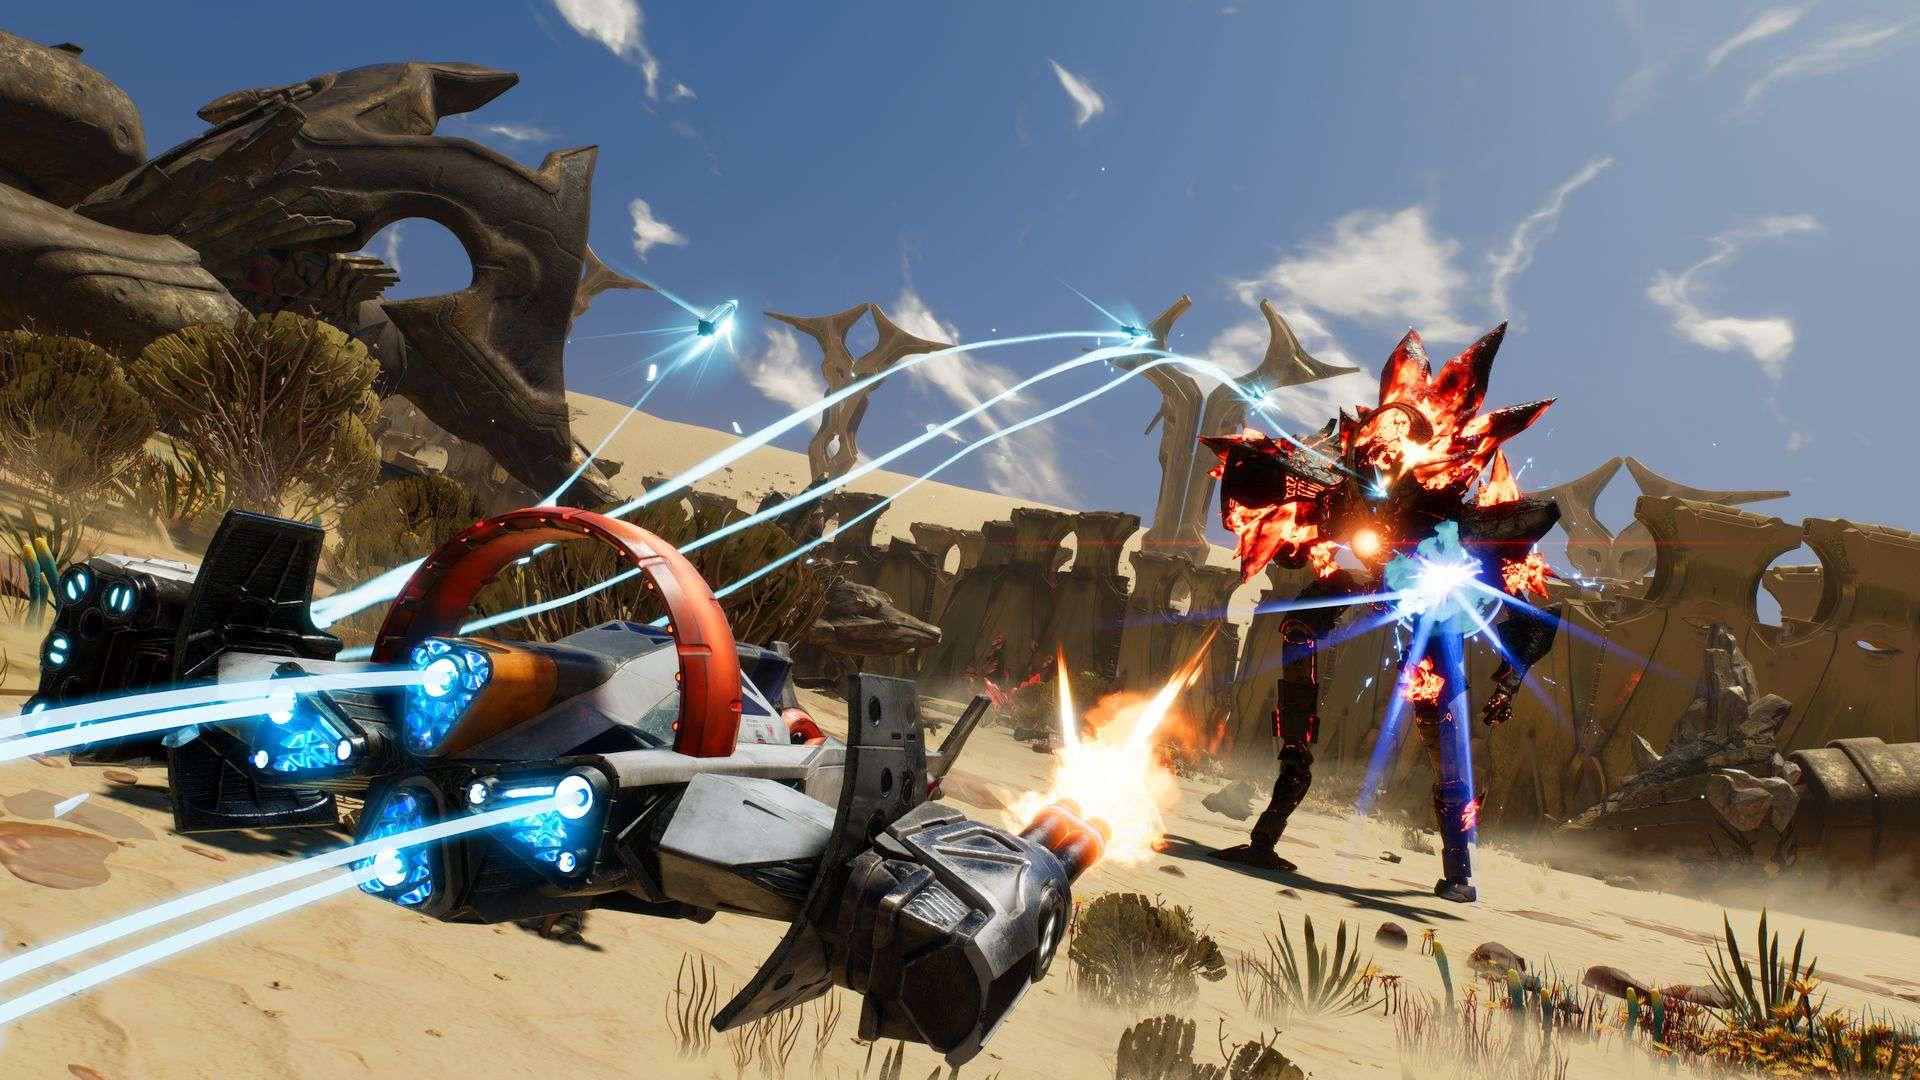 星链:阿特拉斯之战(Starlink: Battle for Atlas)插图2